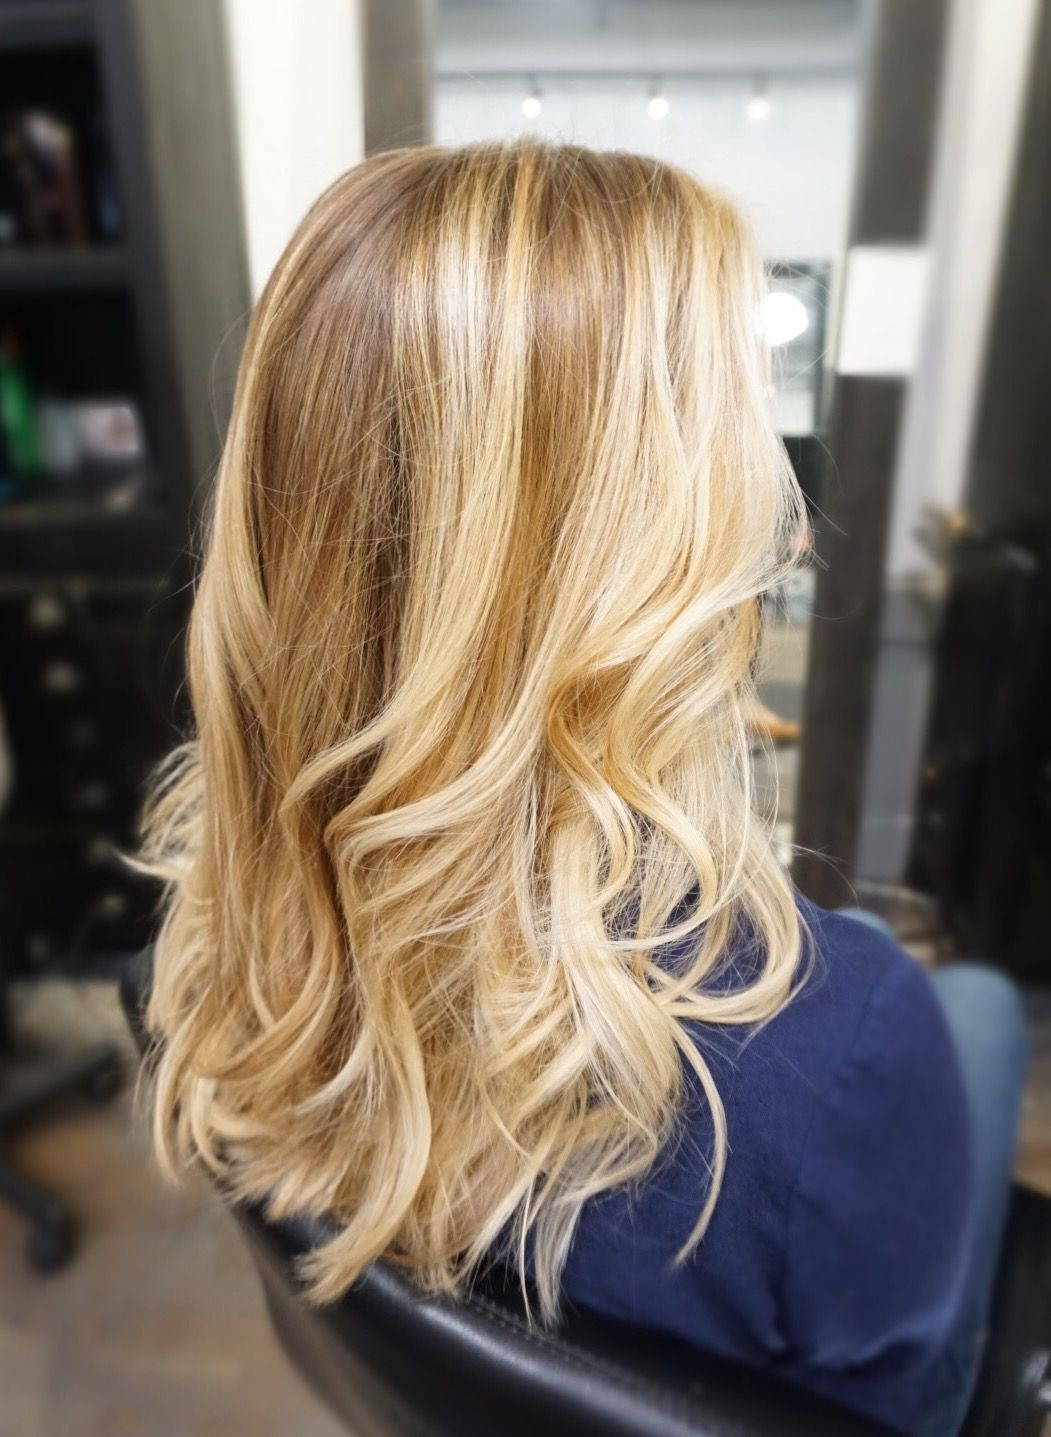 Astonishing Honey Blonde And Caramel Toned Balayage Highlights Tangled Short Hairstyles Gunalazisus